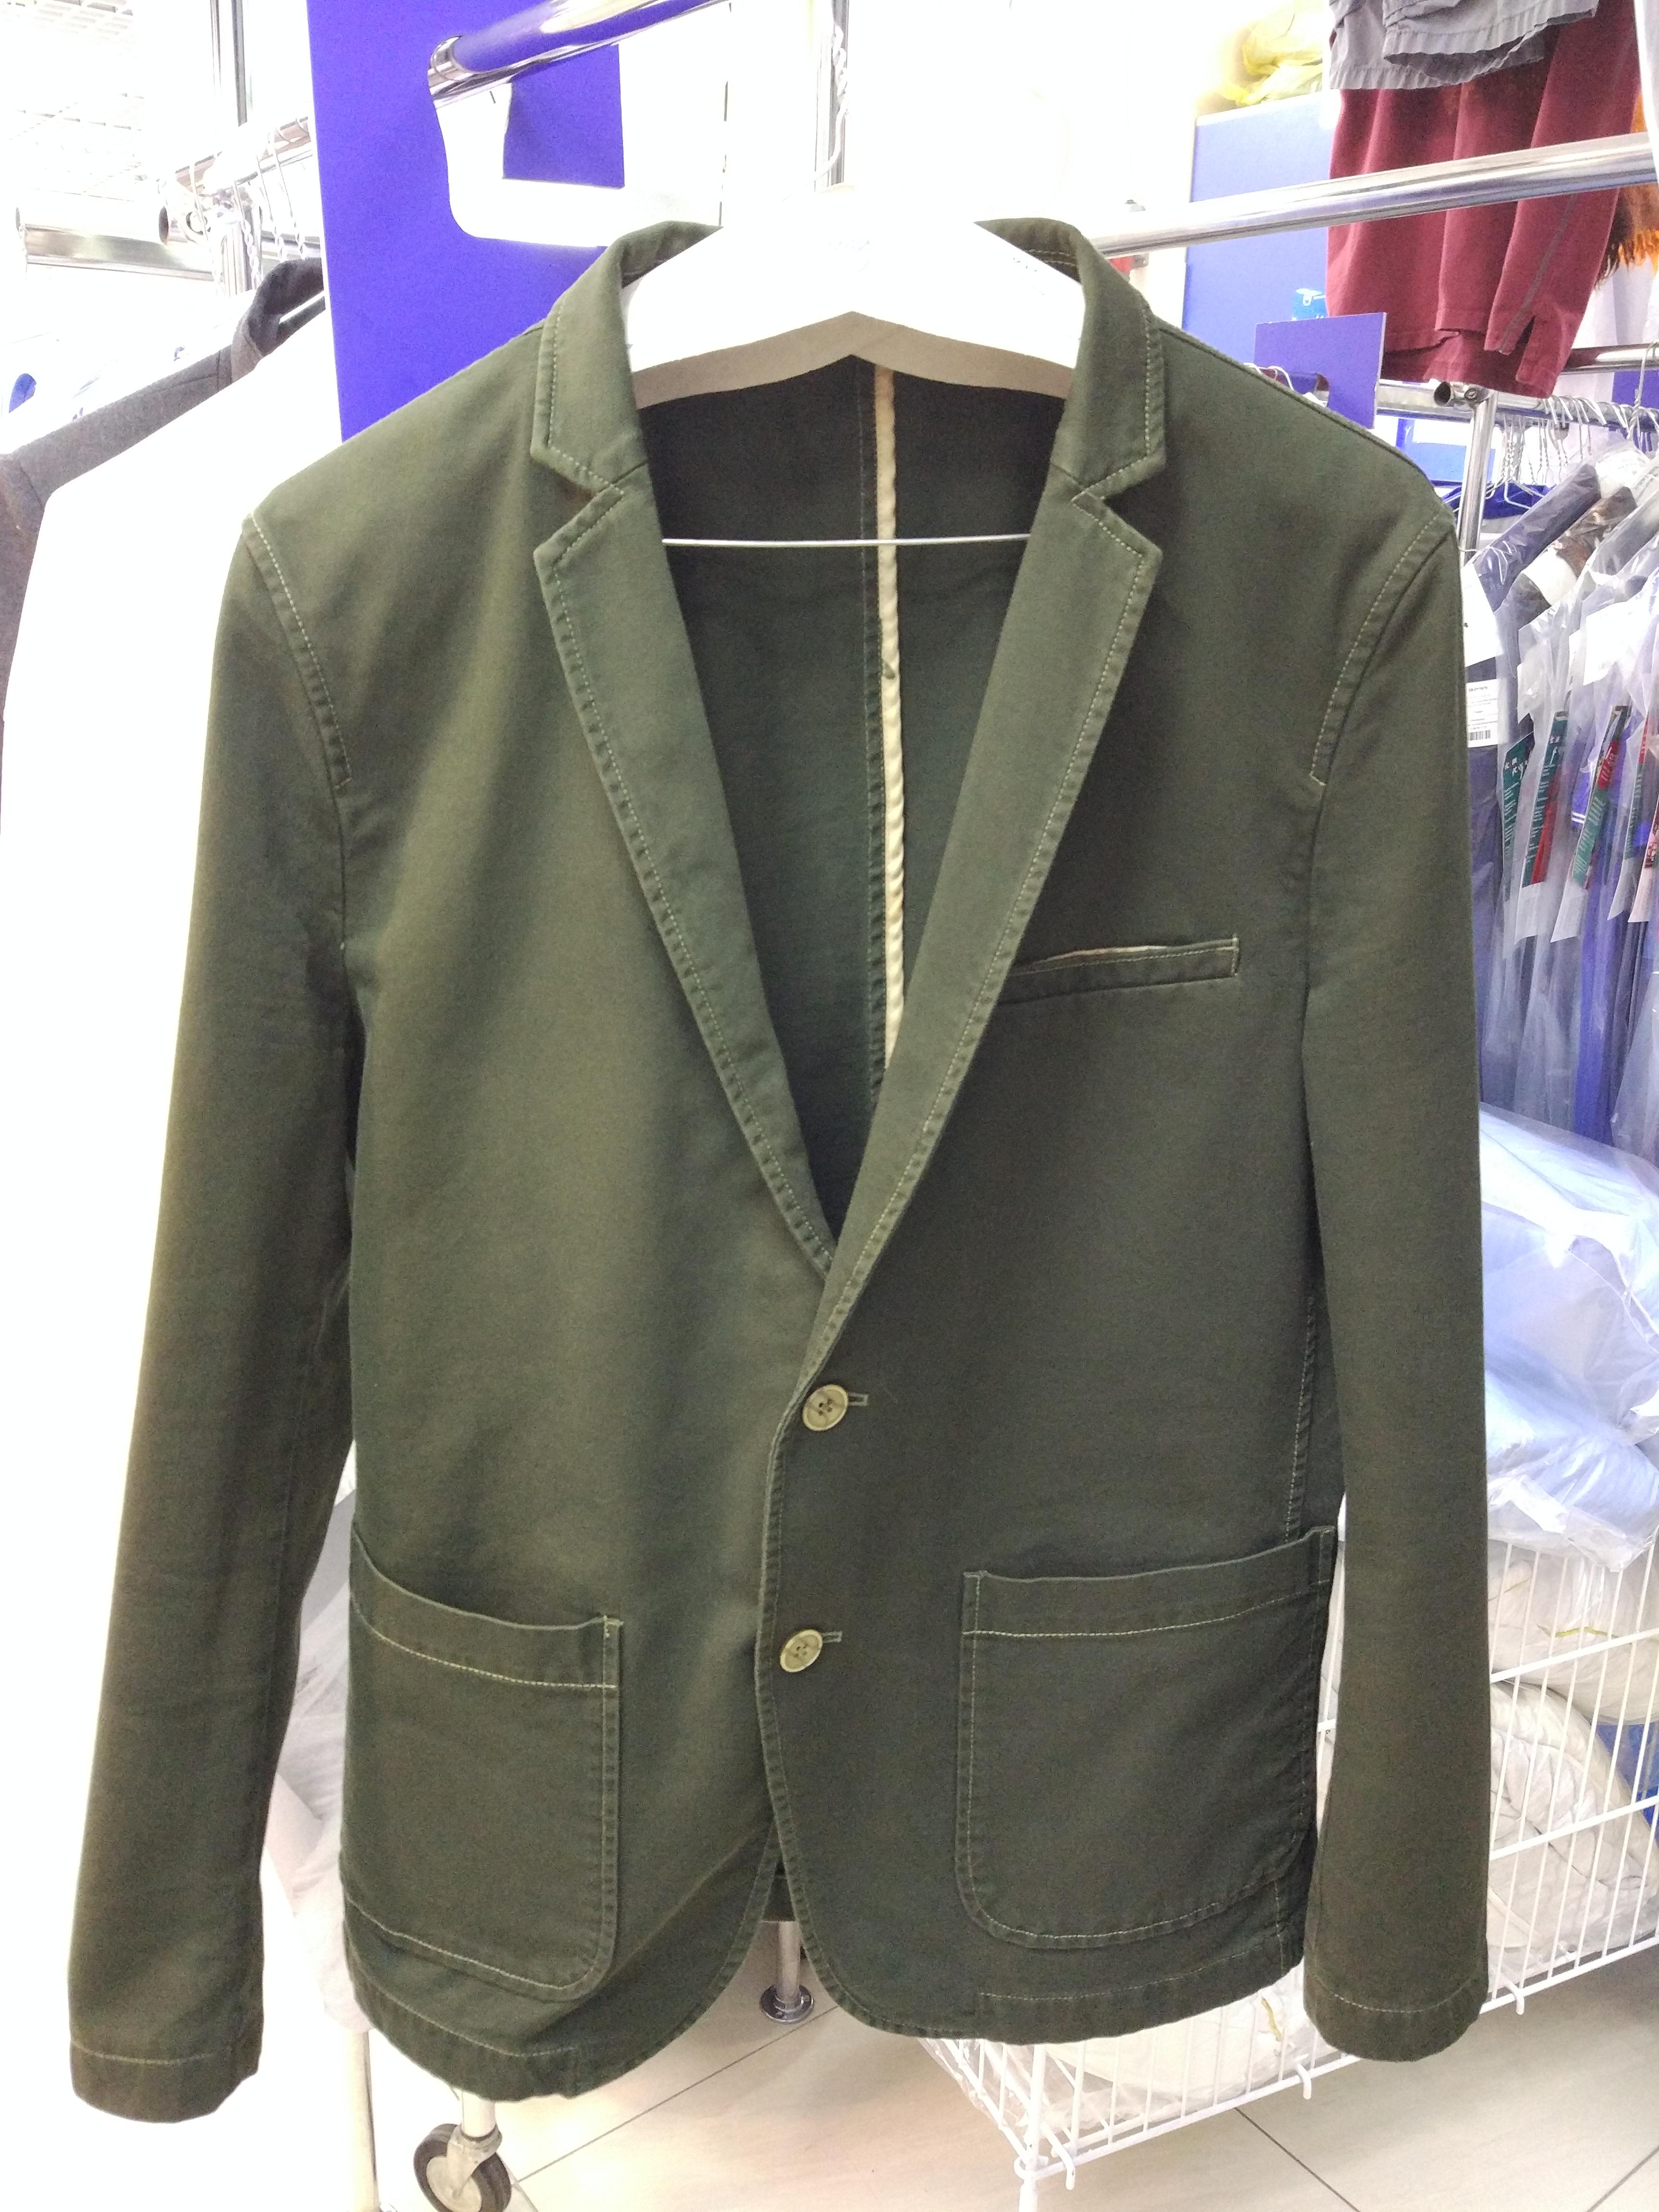 After-Окраска пиджака